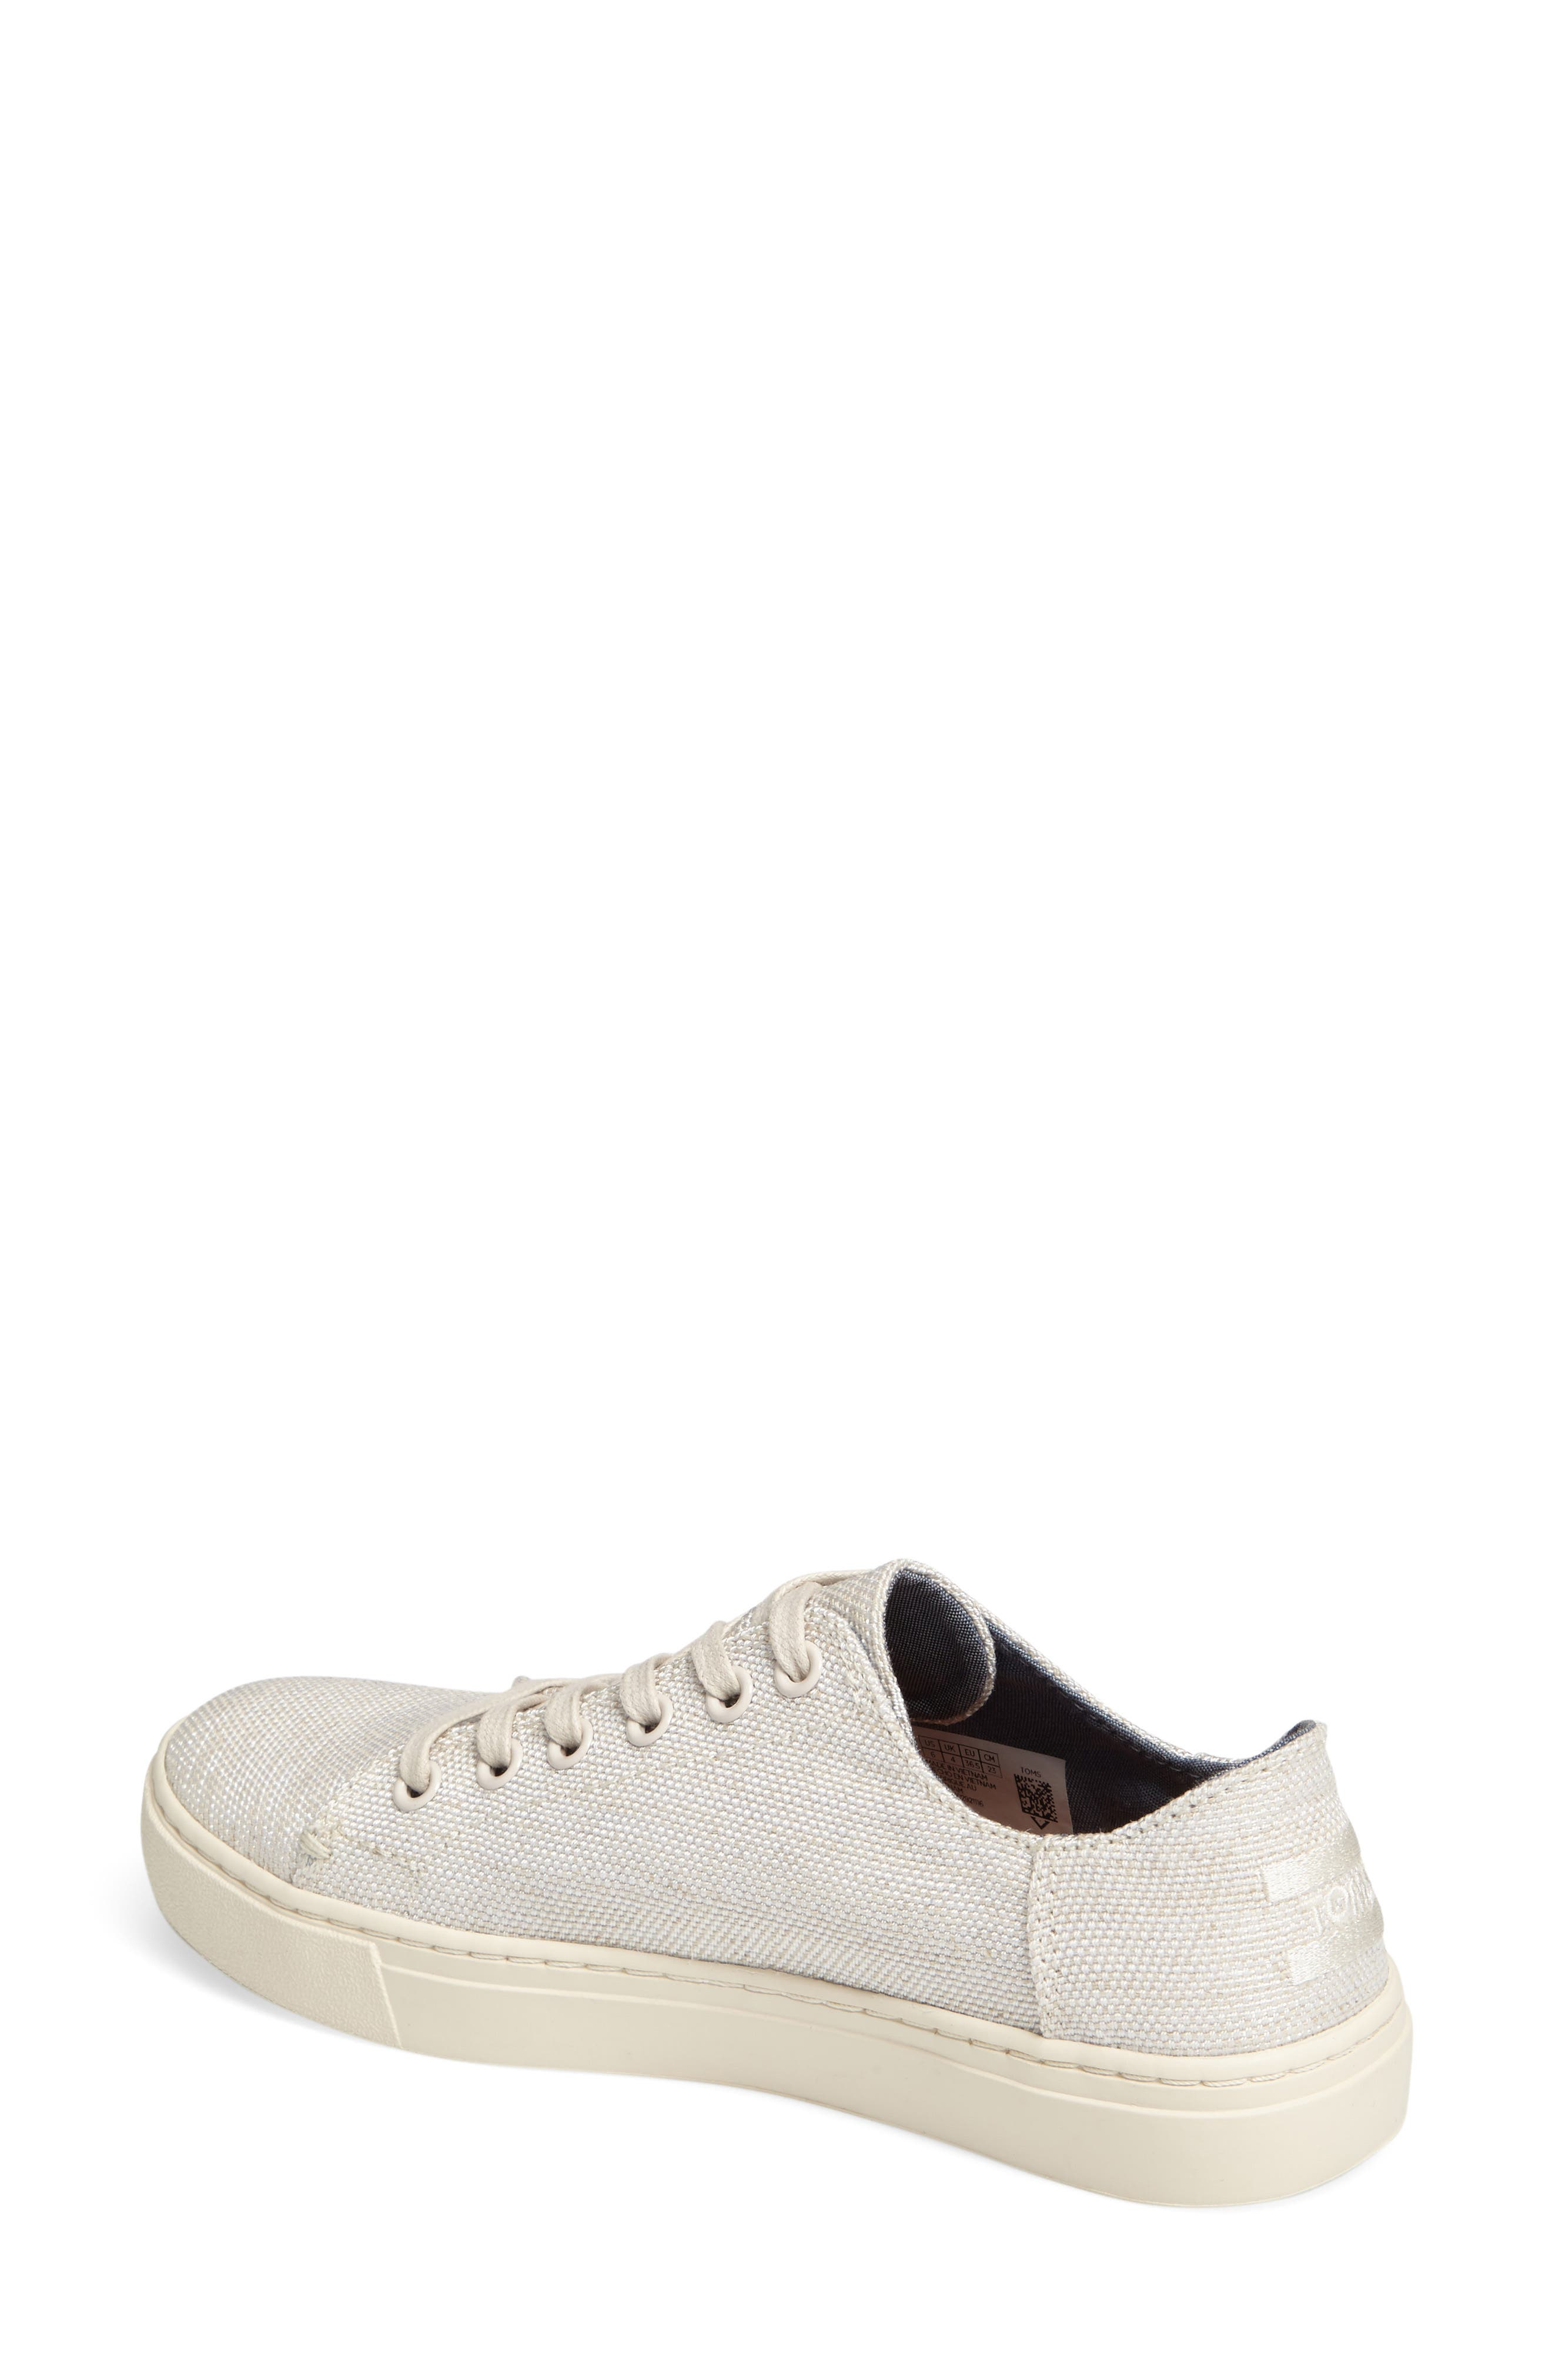 Lenox Sneaker,                             Alternate thumbnail 31, color,